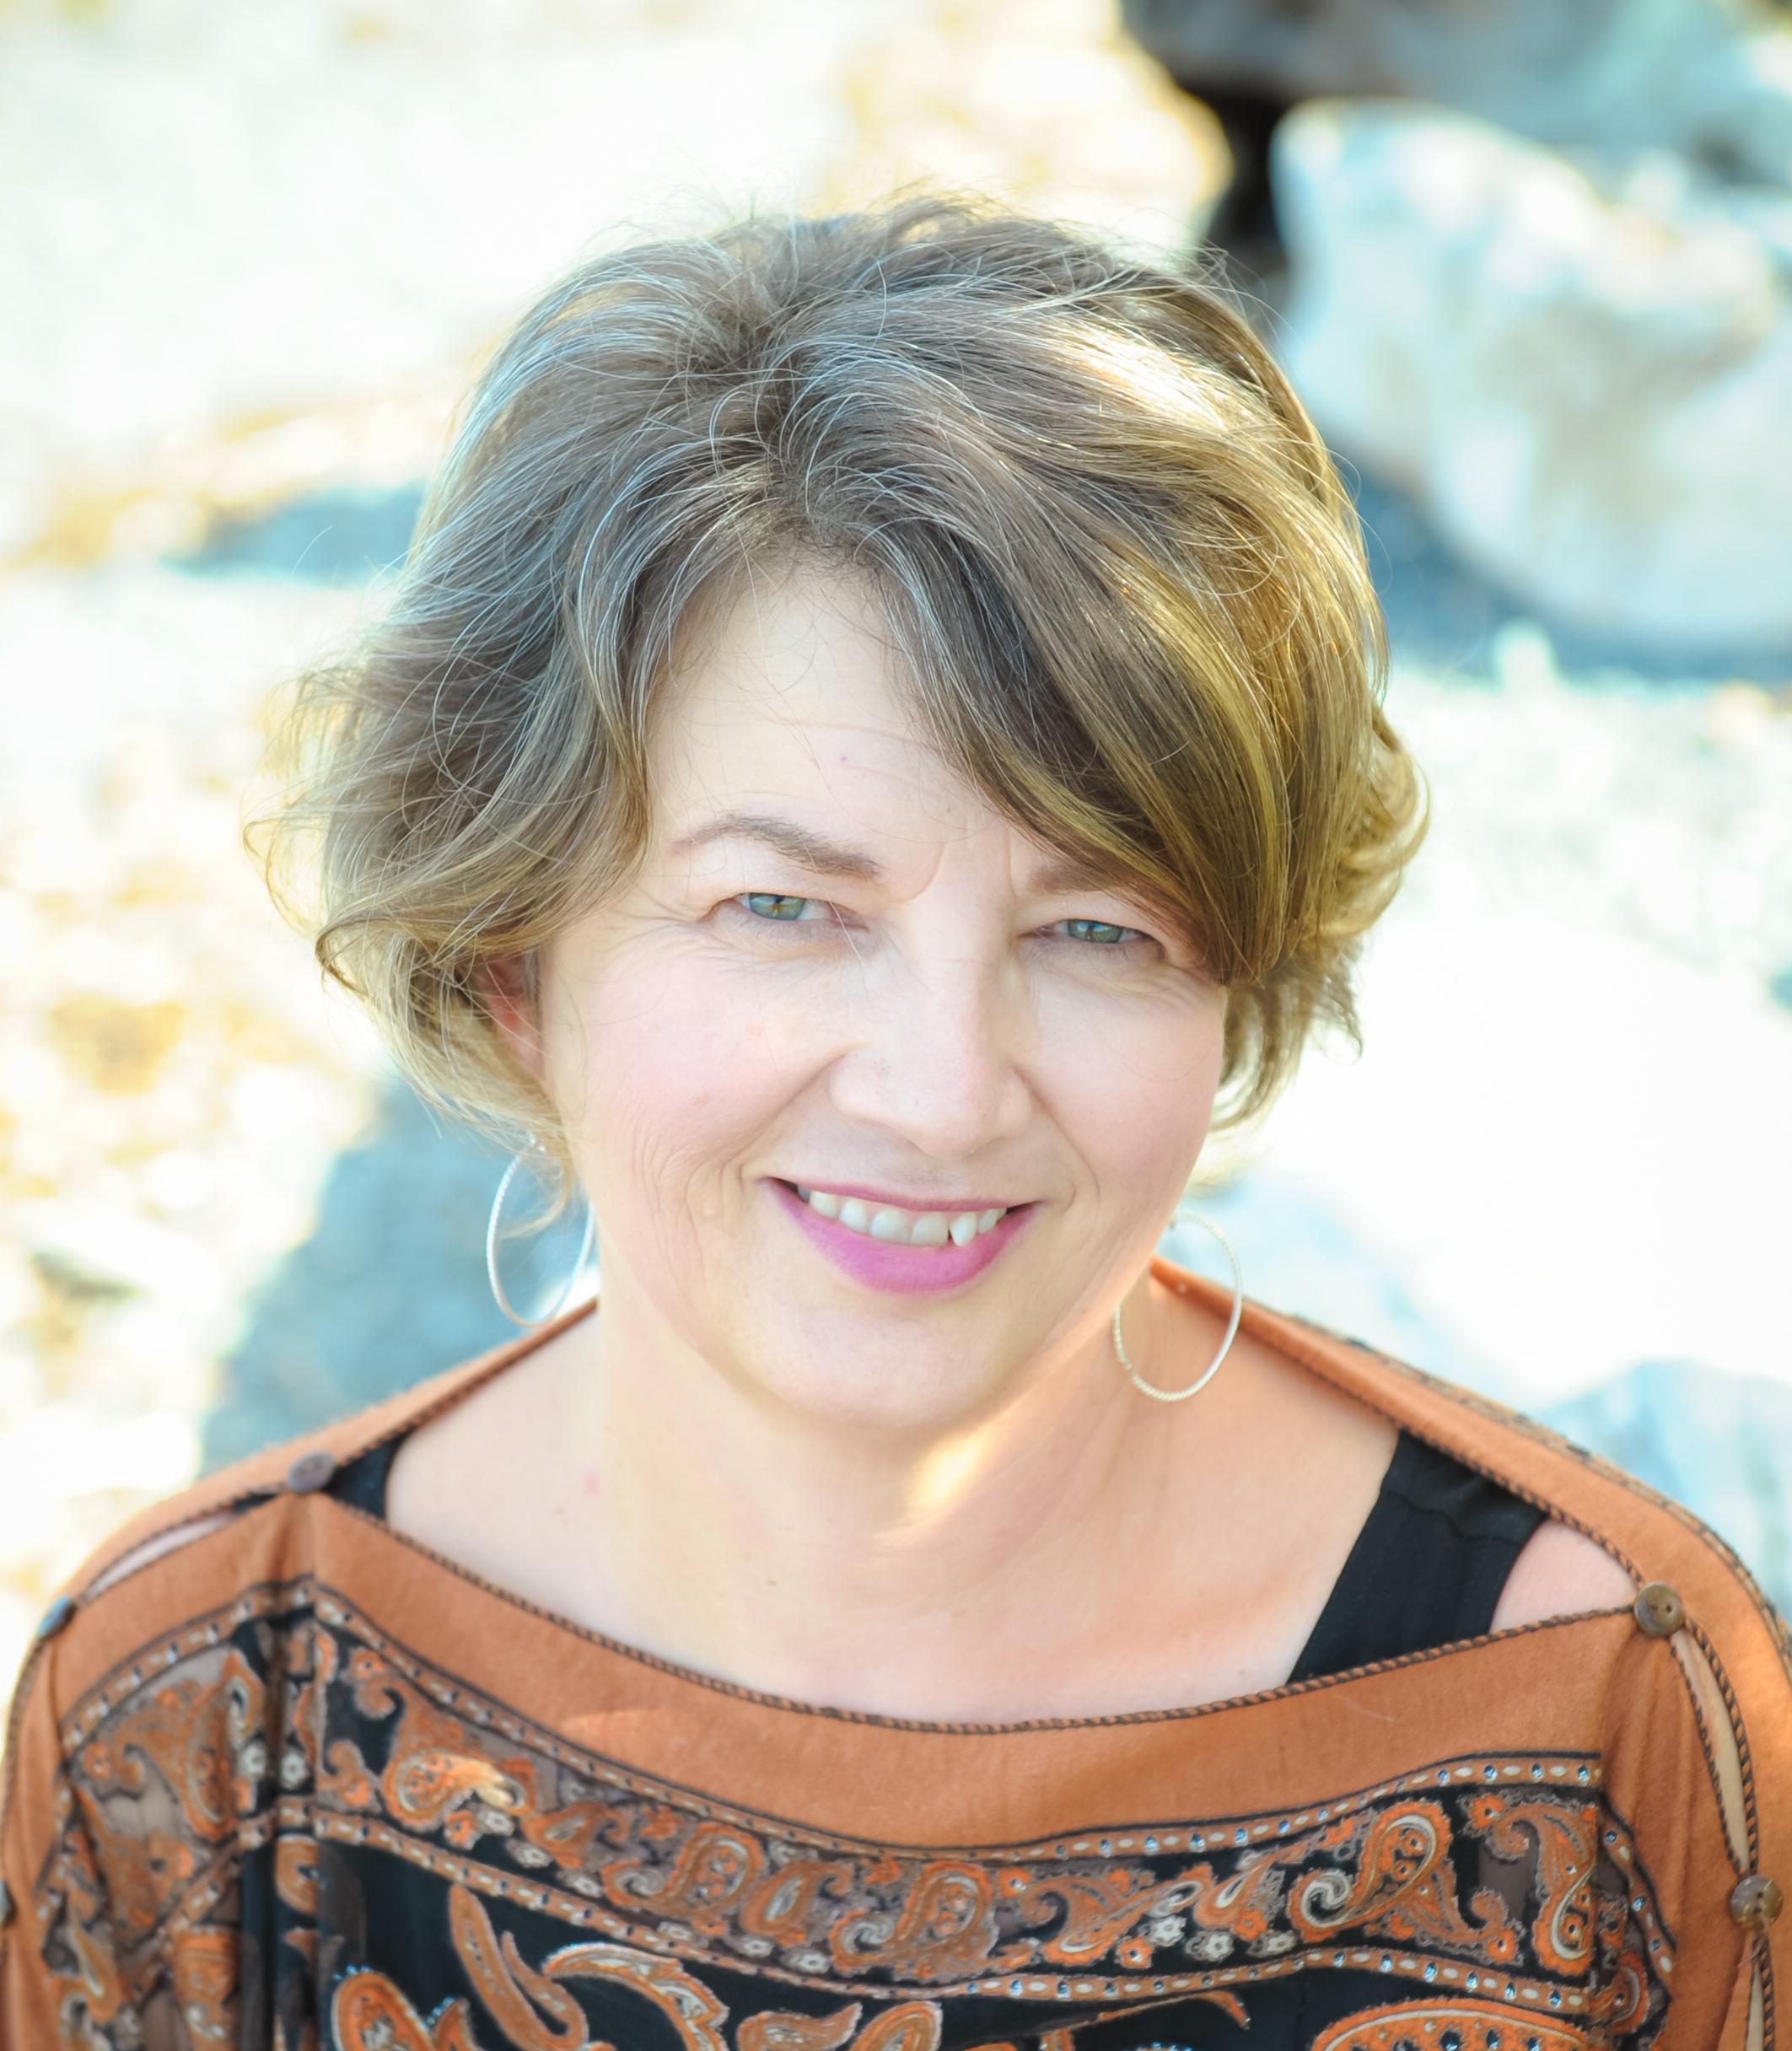 Victoria Pawlowski, R.D., M.Ed. (Counselling Psychology)